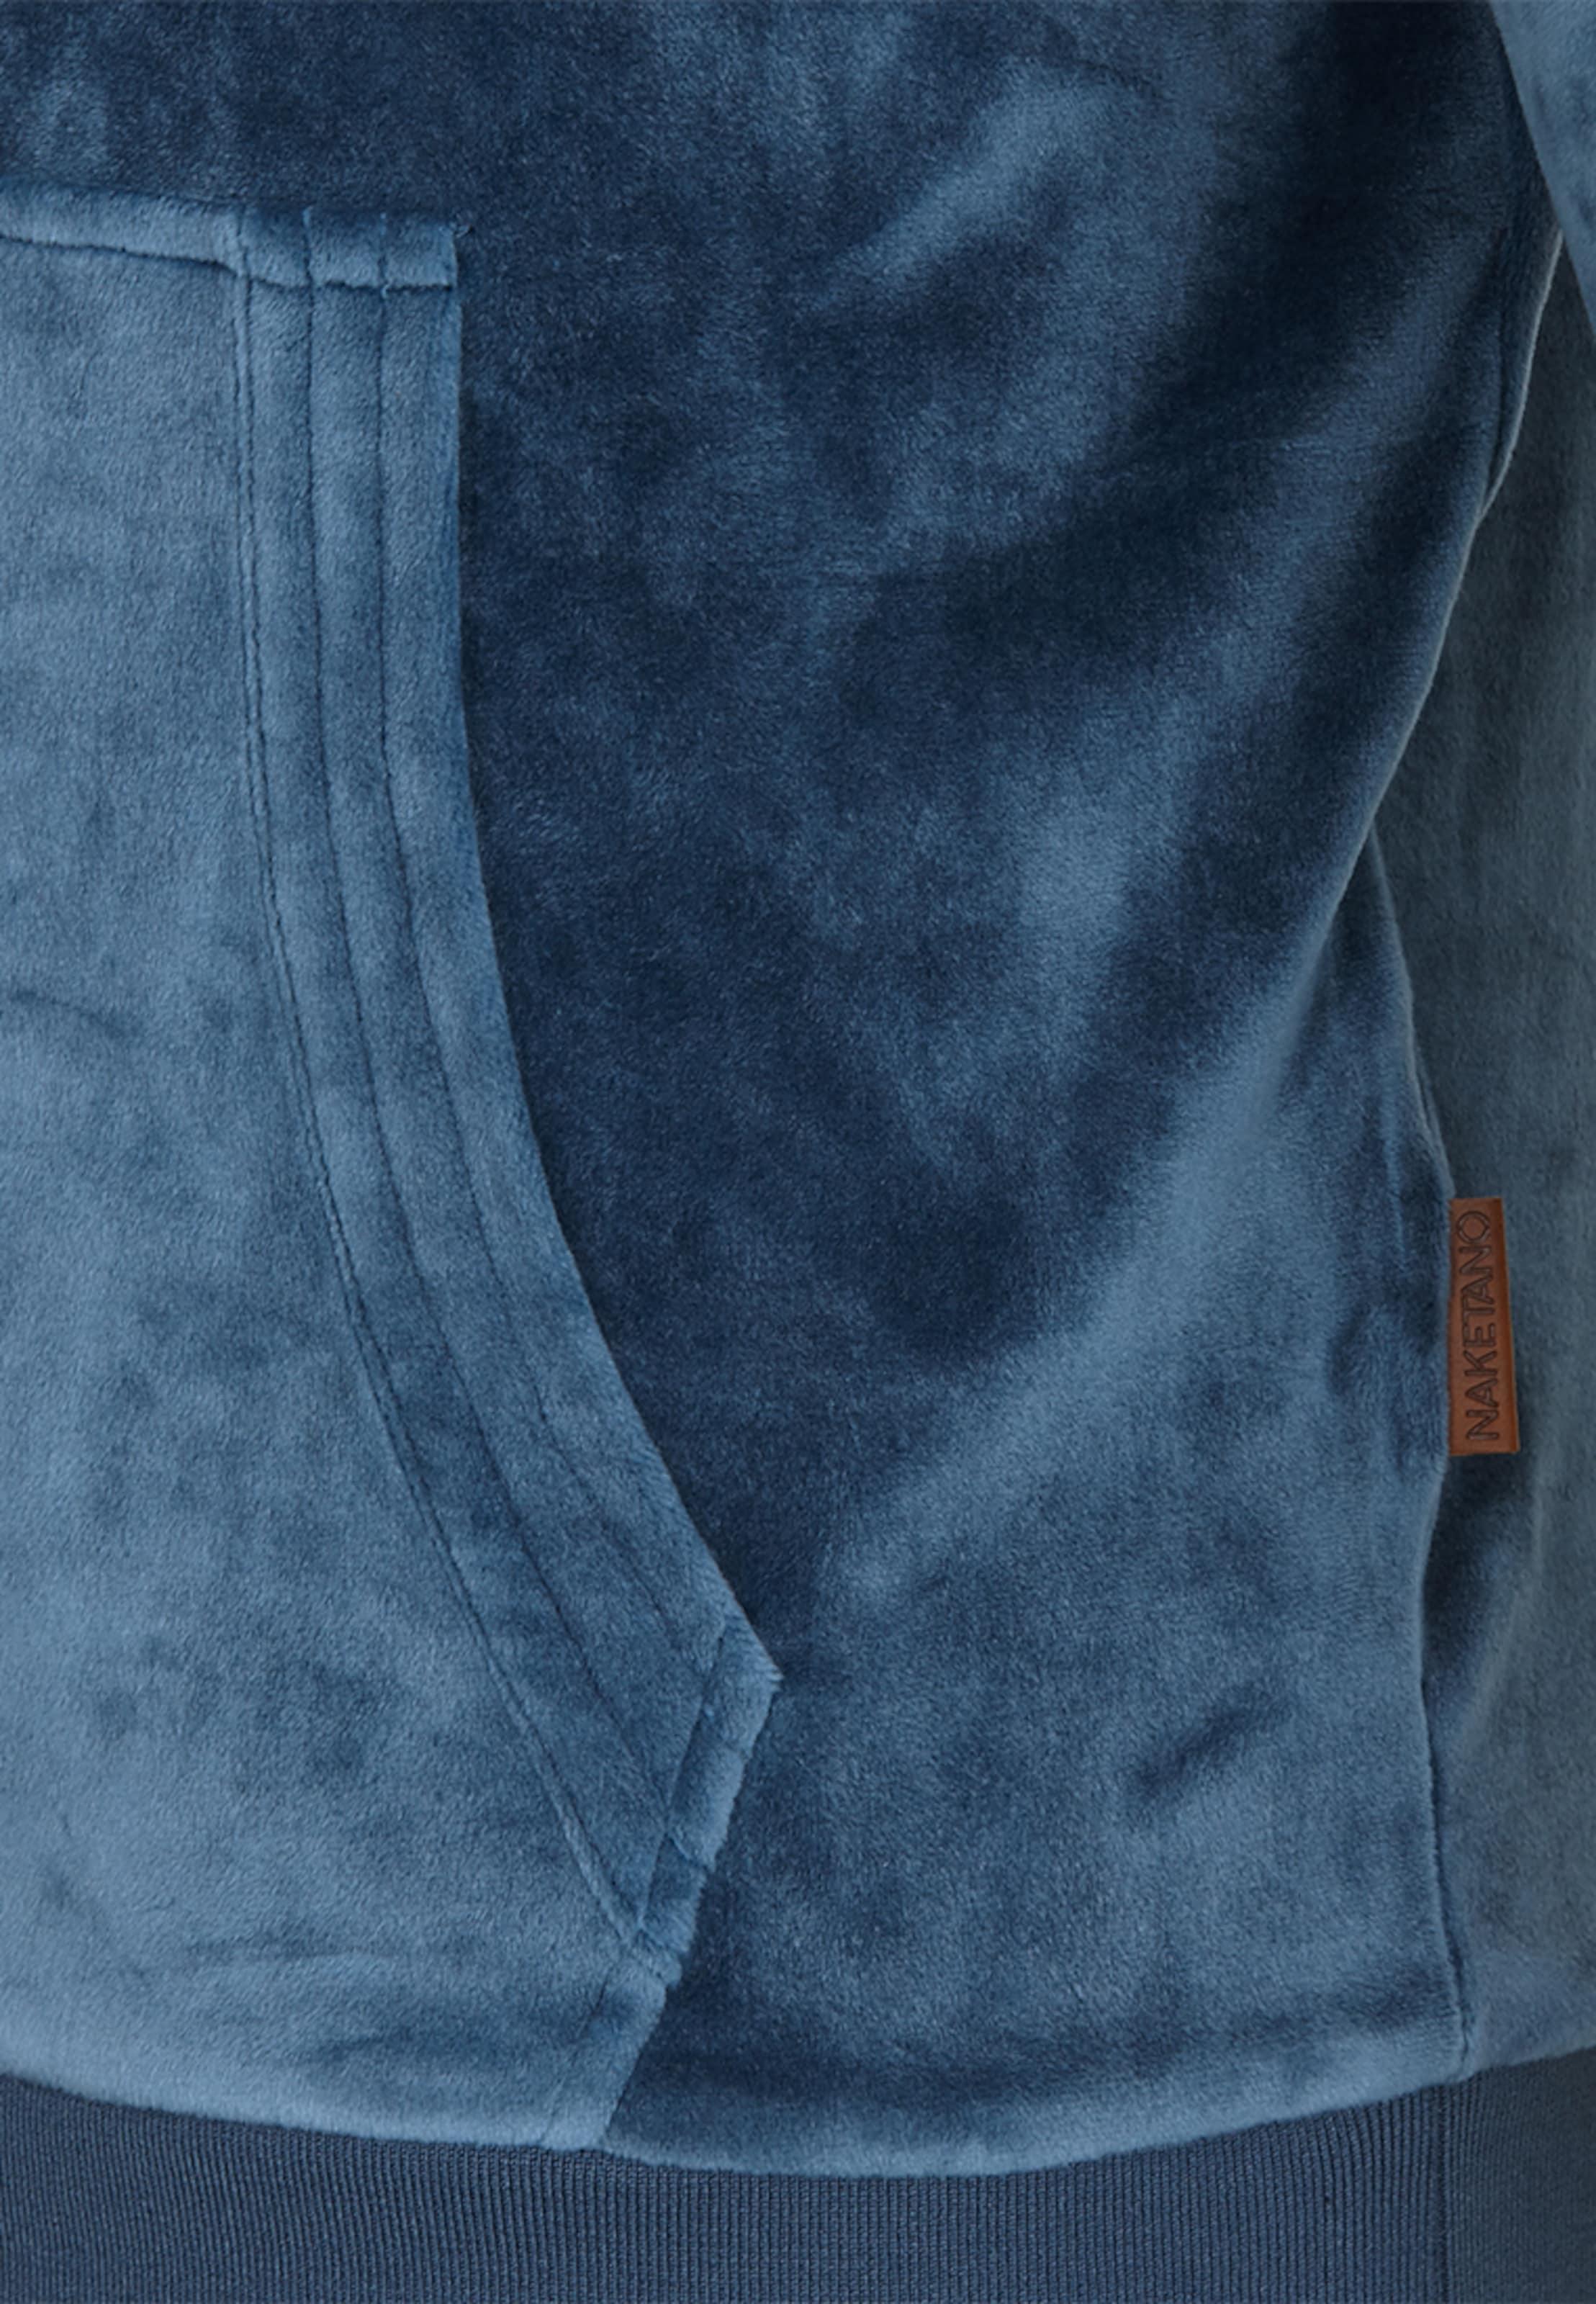 Sweat Naketano En Naketano Bleu Bleu shirt Sweat shirt En Naketano Sweat UMVpLqSzG